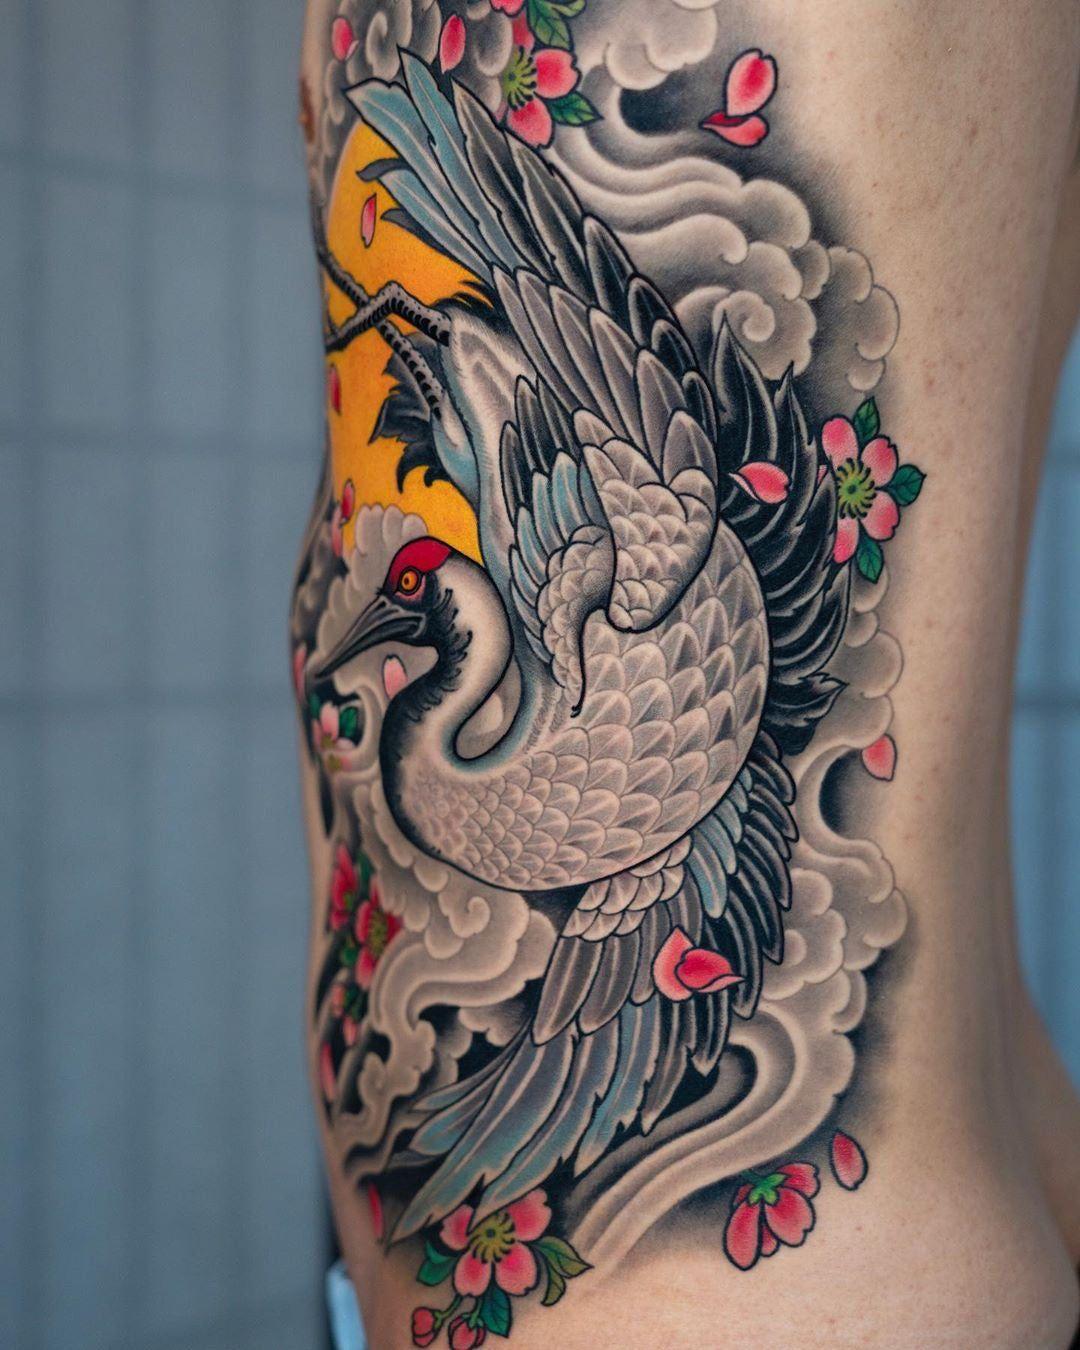 Ghim Của Naige Tren Tattoos Trong 2020 Hinh Xăm Hinh Xăm Con Cong Hinh Xăm Nhật